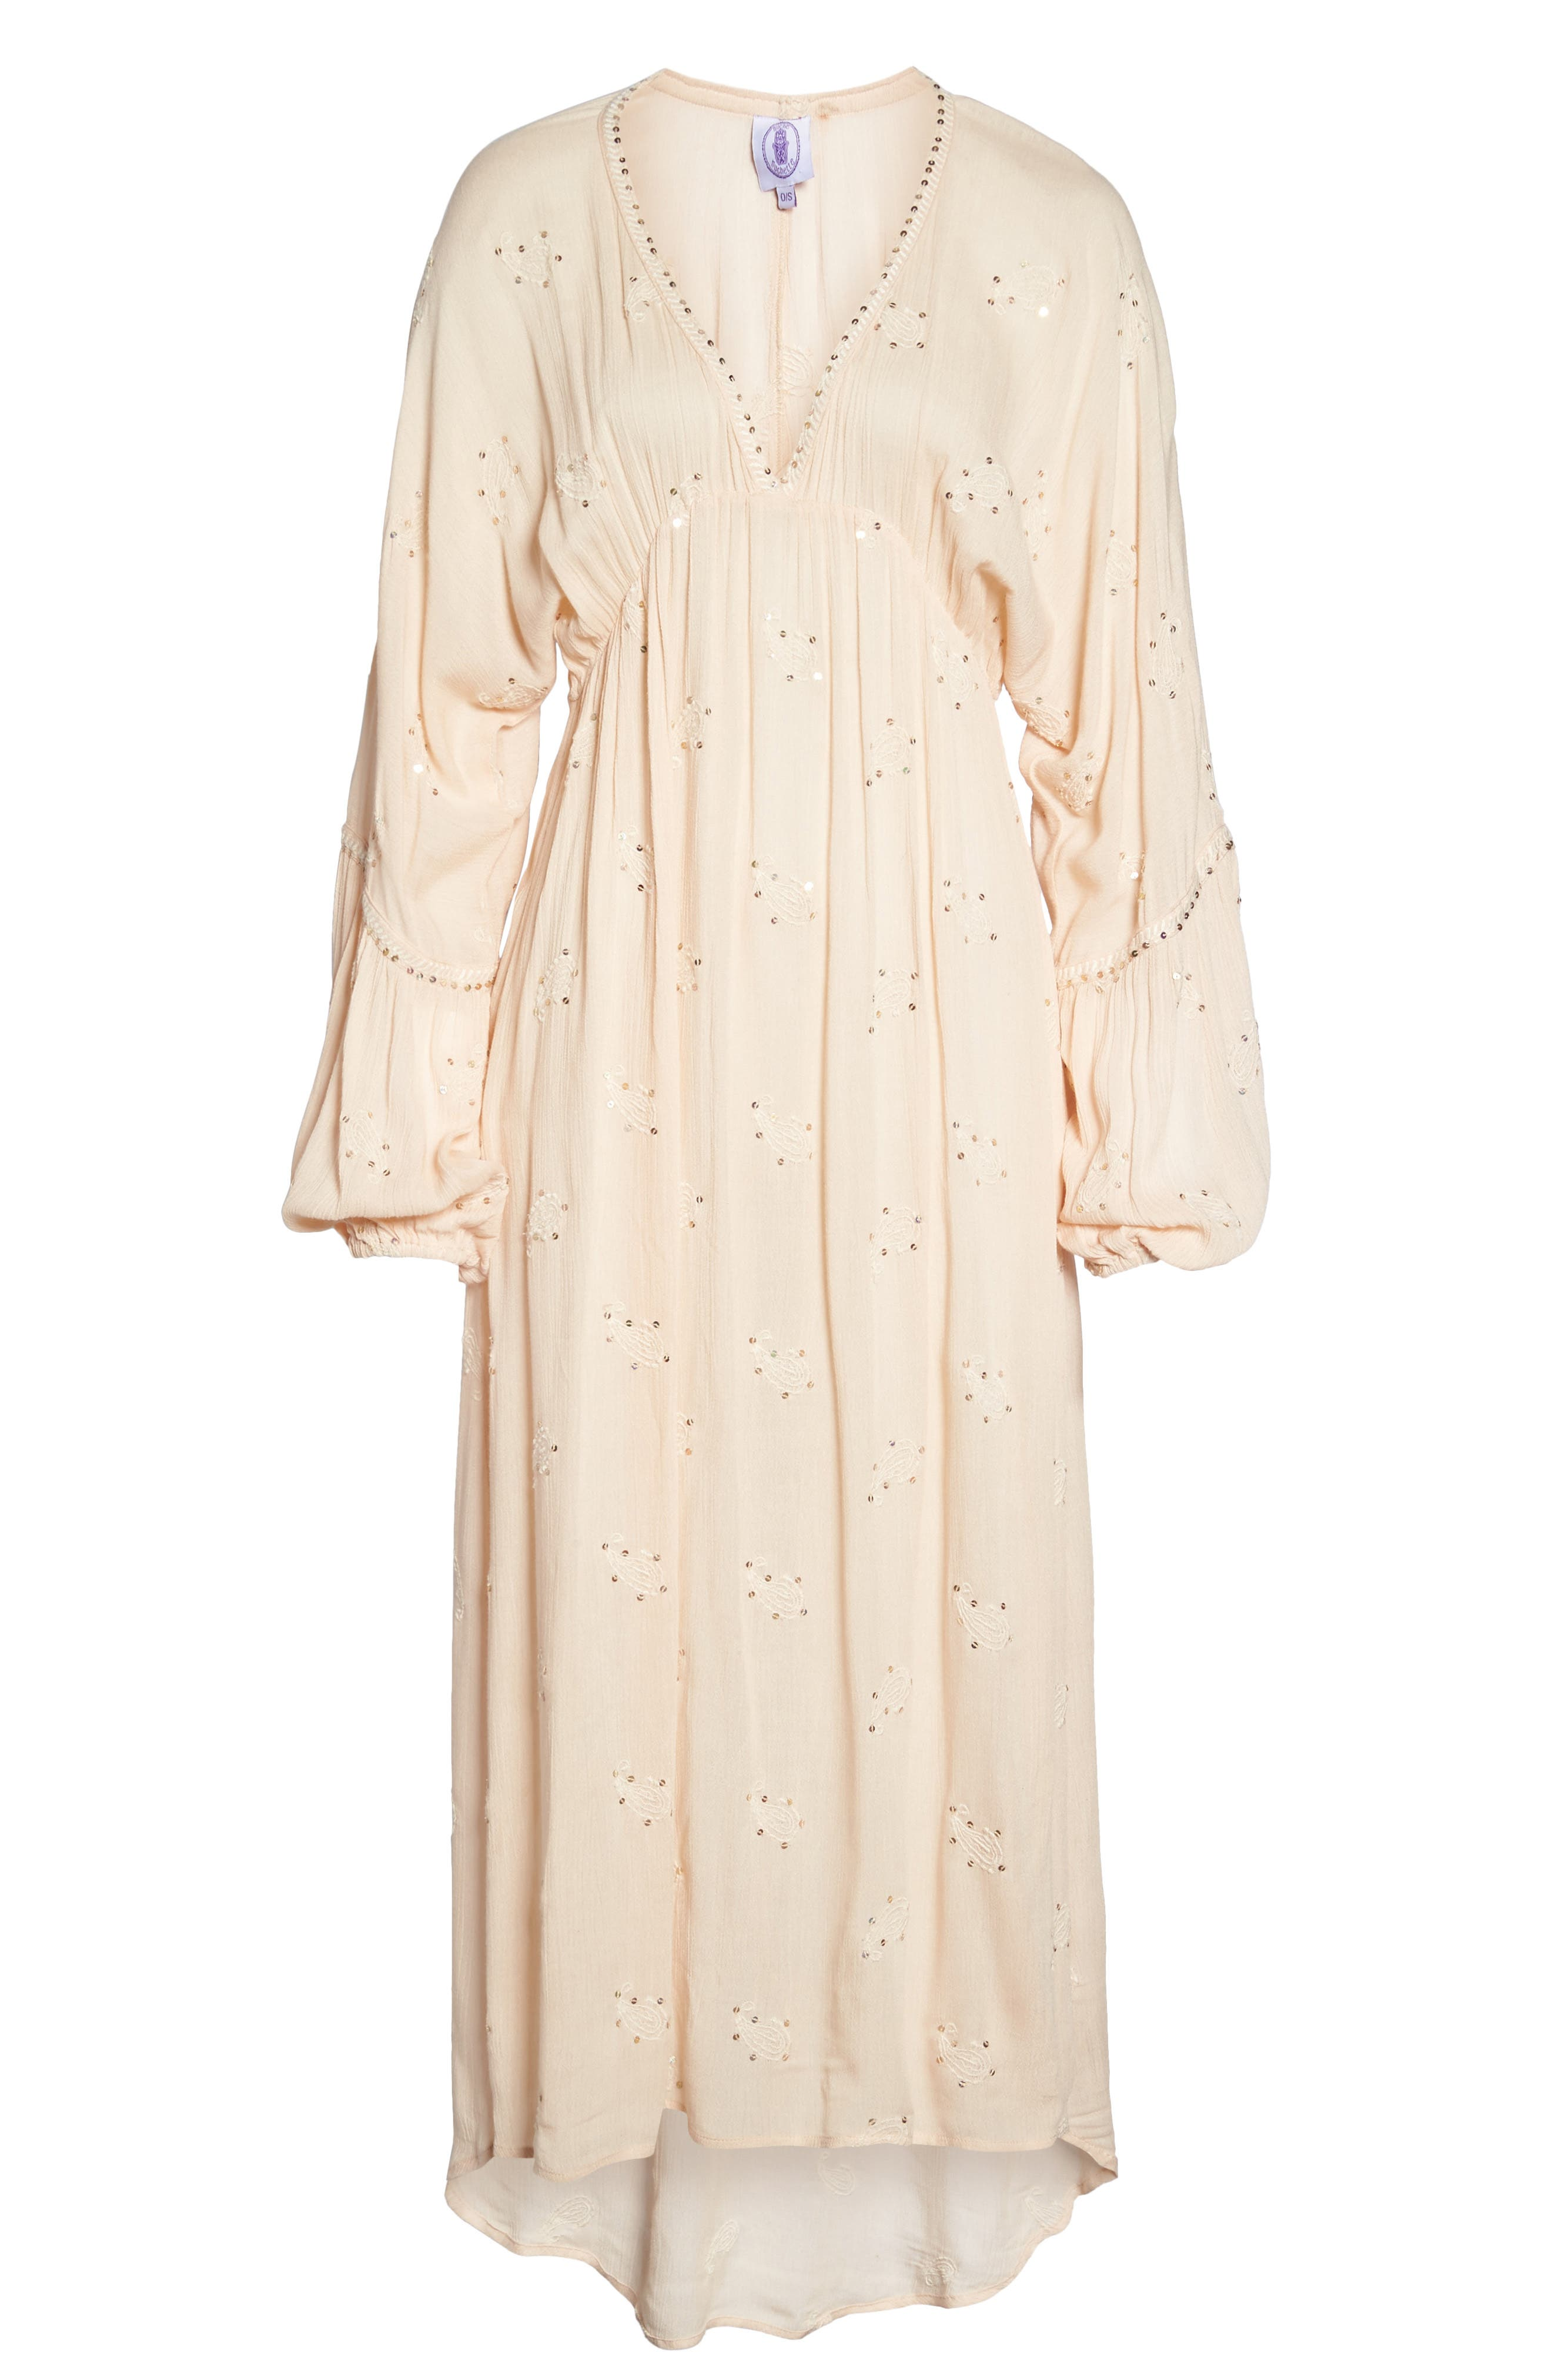 Mercer Cover-Up Maxi Dress,                             Alternate thumbnail 6, color,                             650